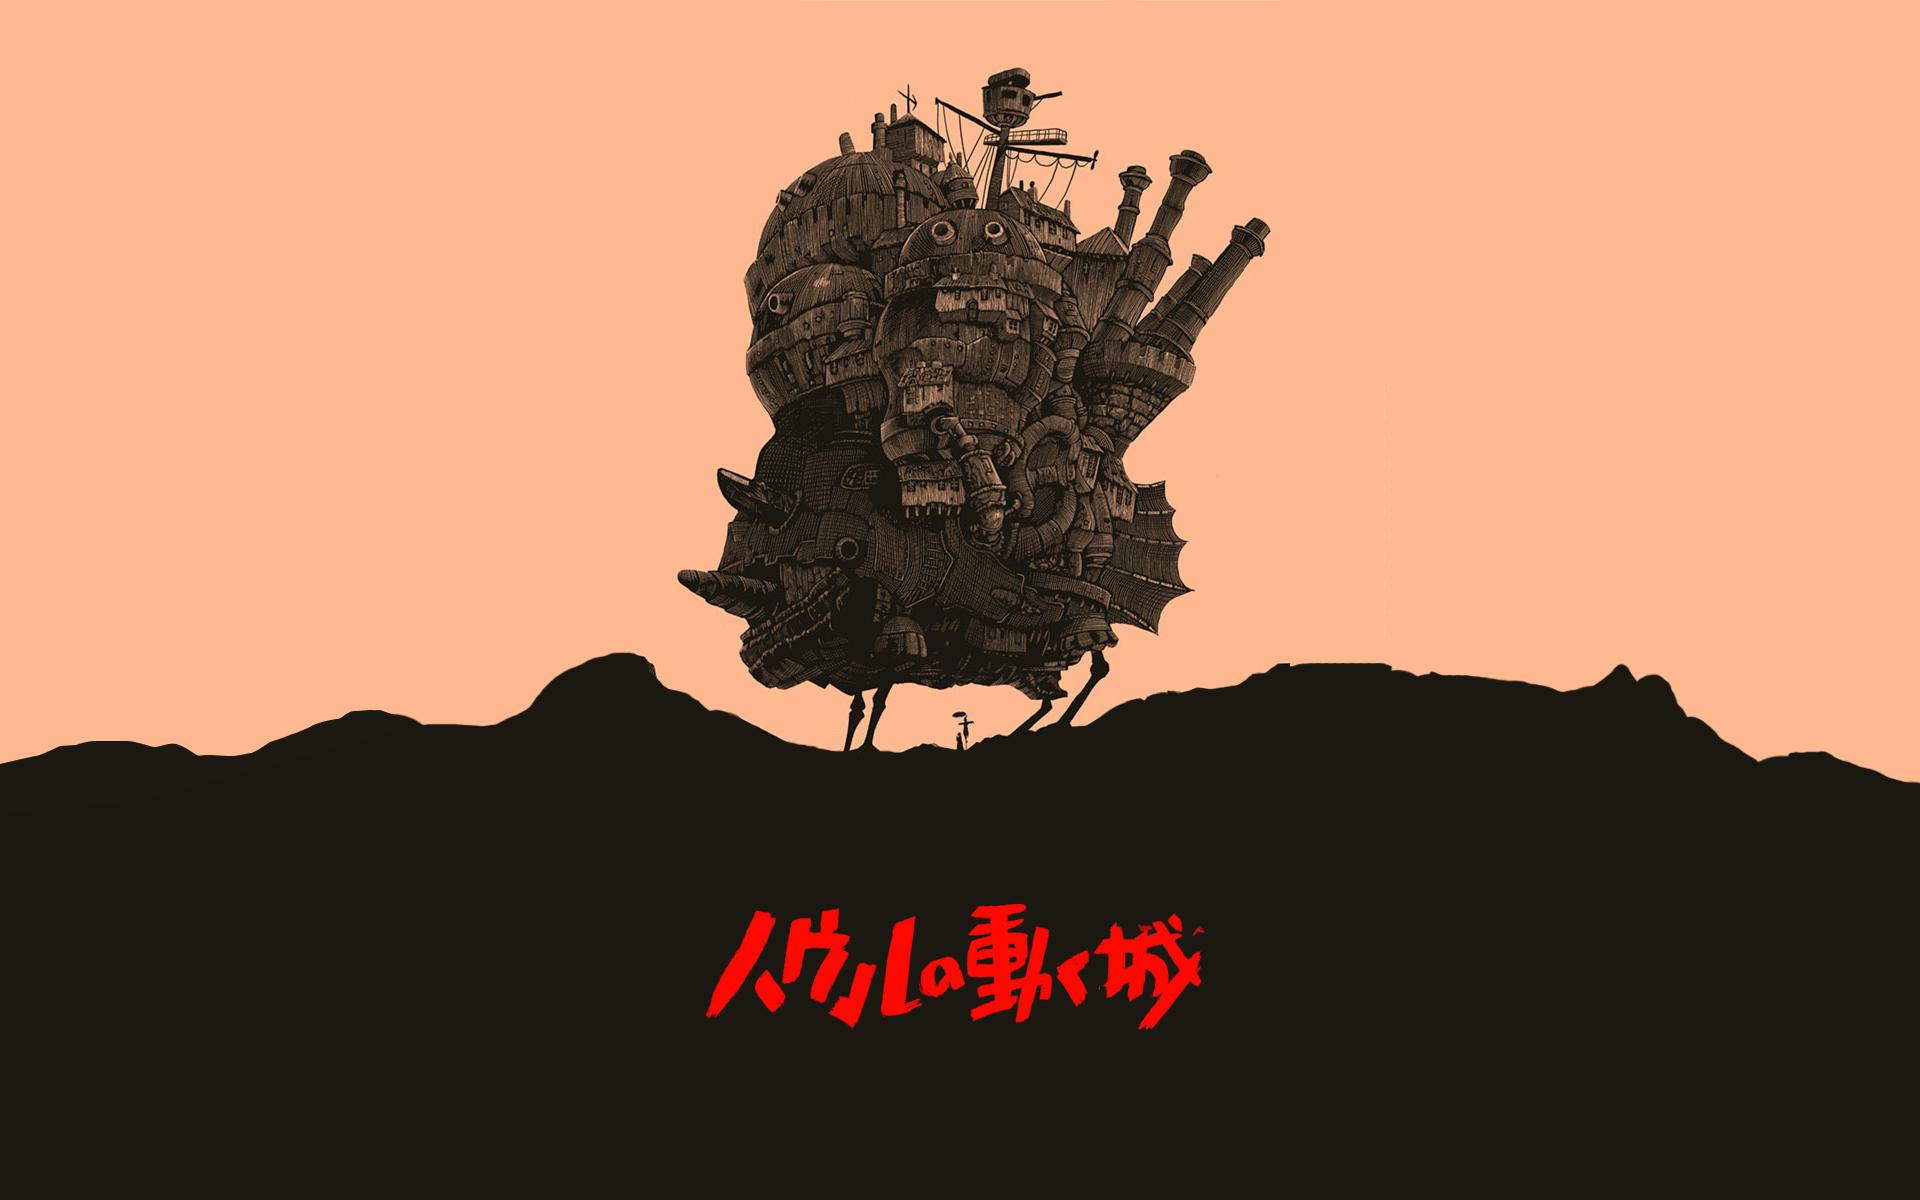 Wallpaper Olly Moss Studio Ghibli Hayao Miyazaki Howls